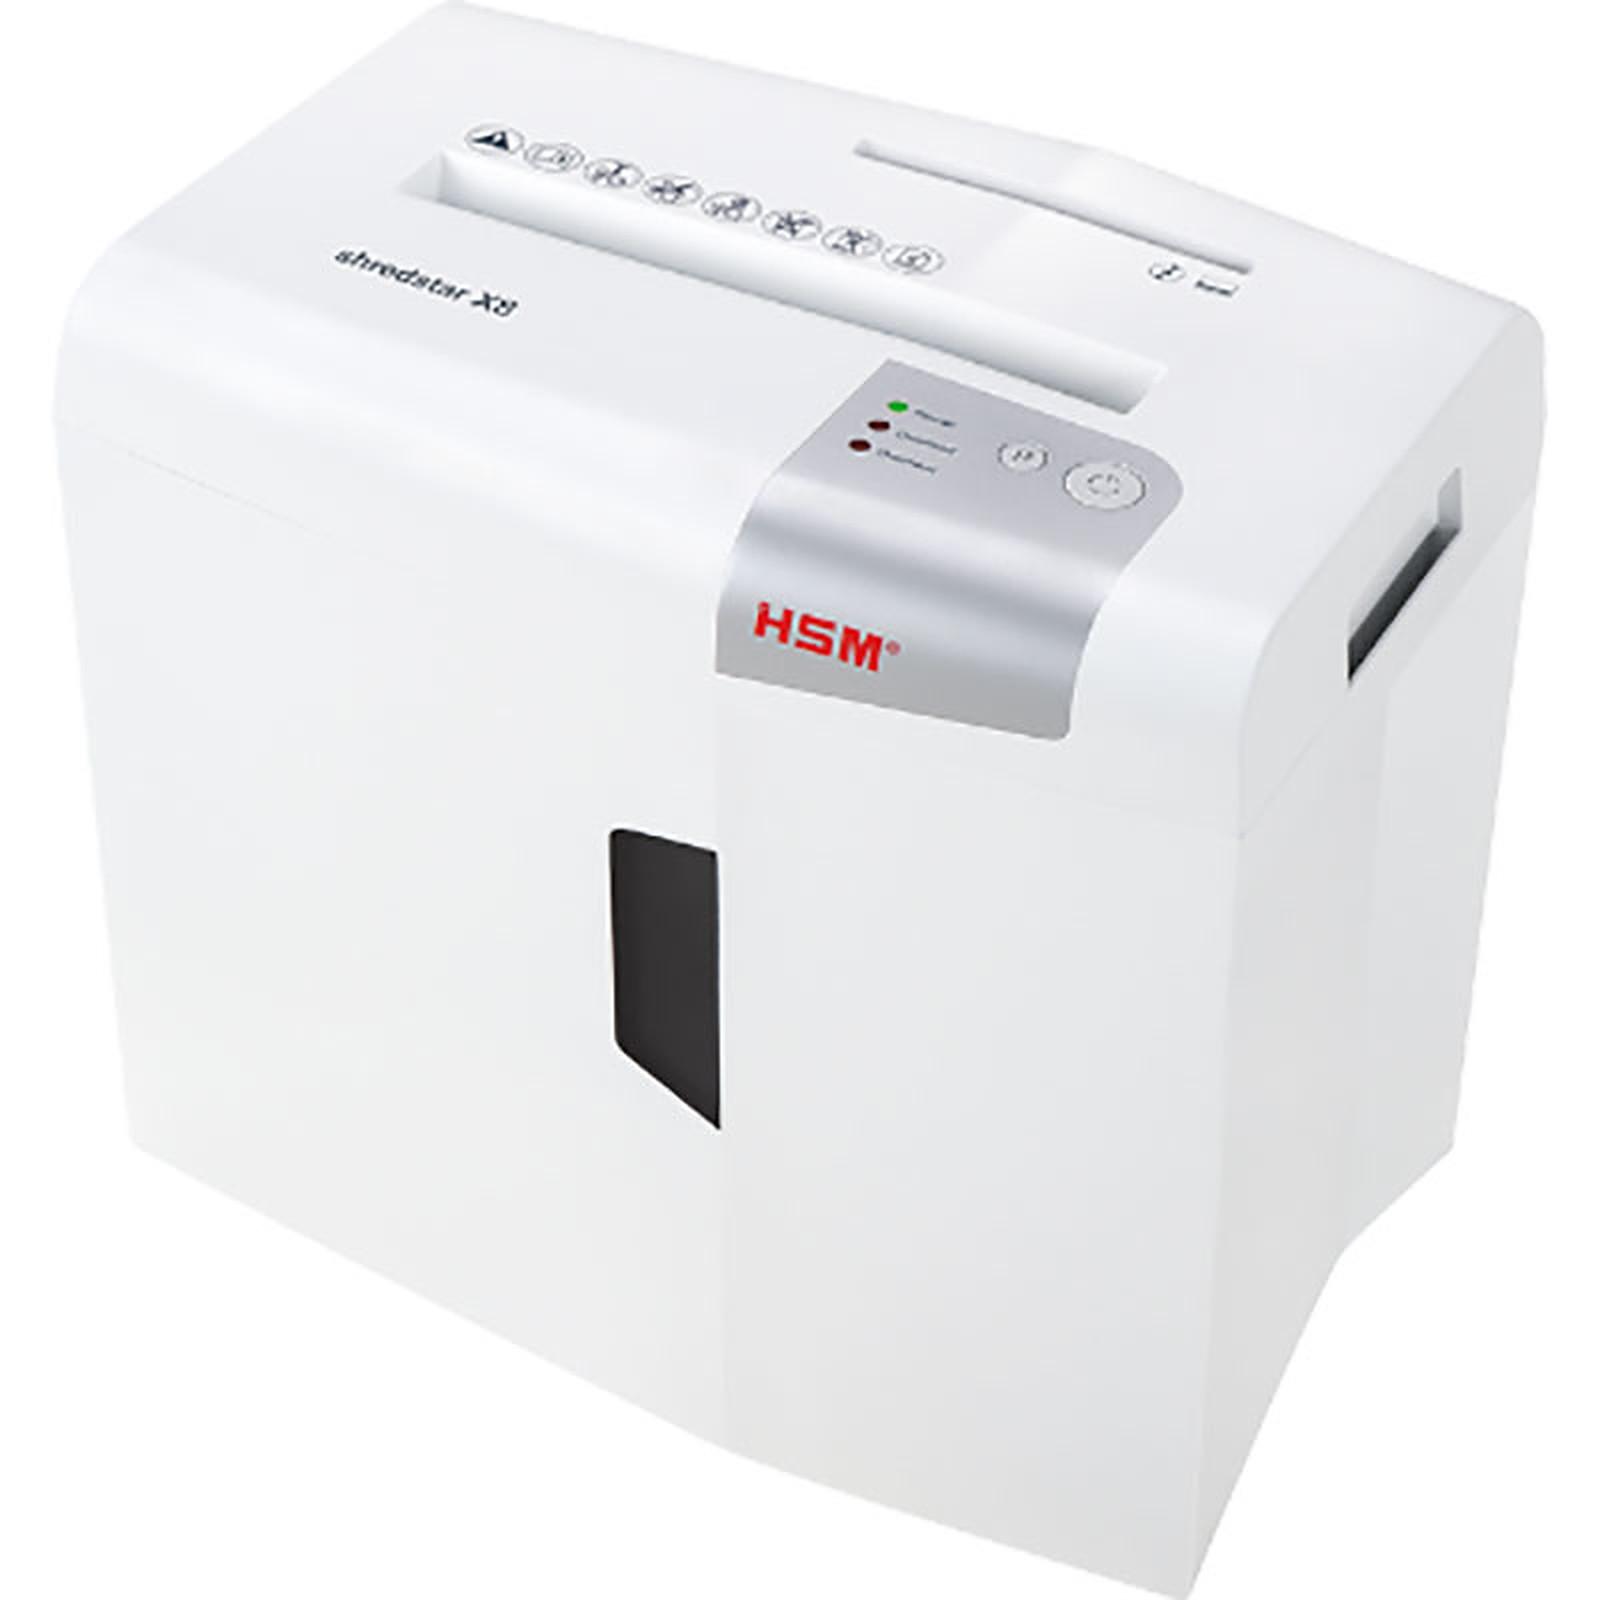 HSM Shredstar X8 - 4.5 x 30 mm